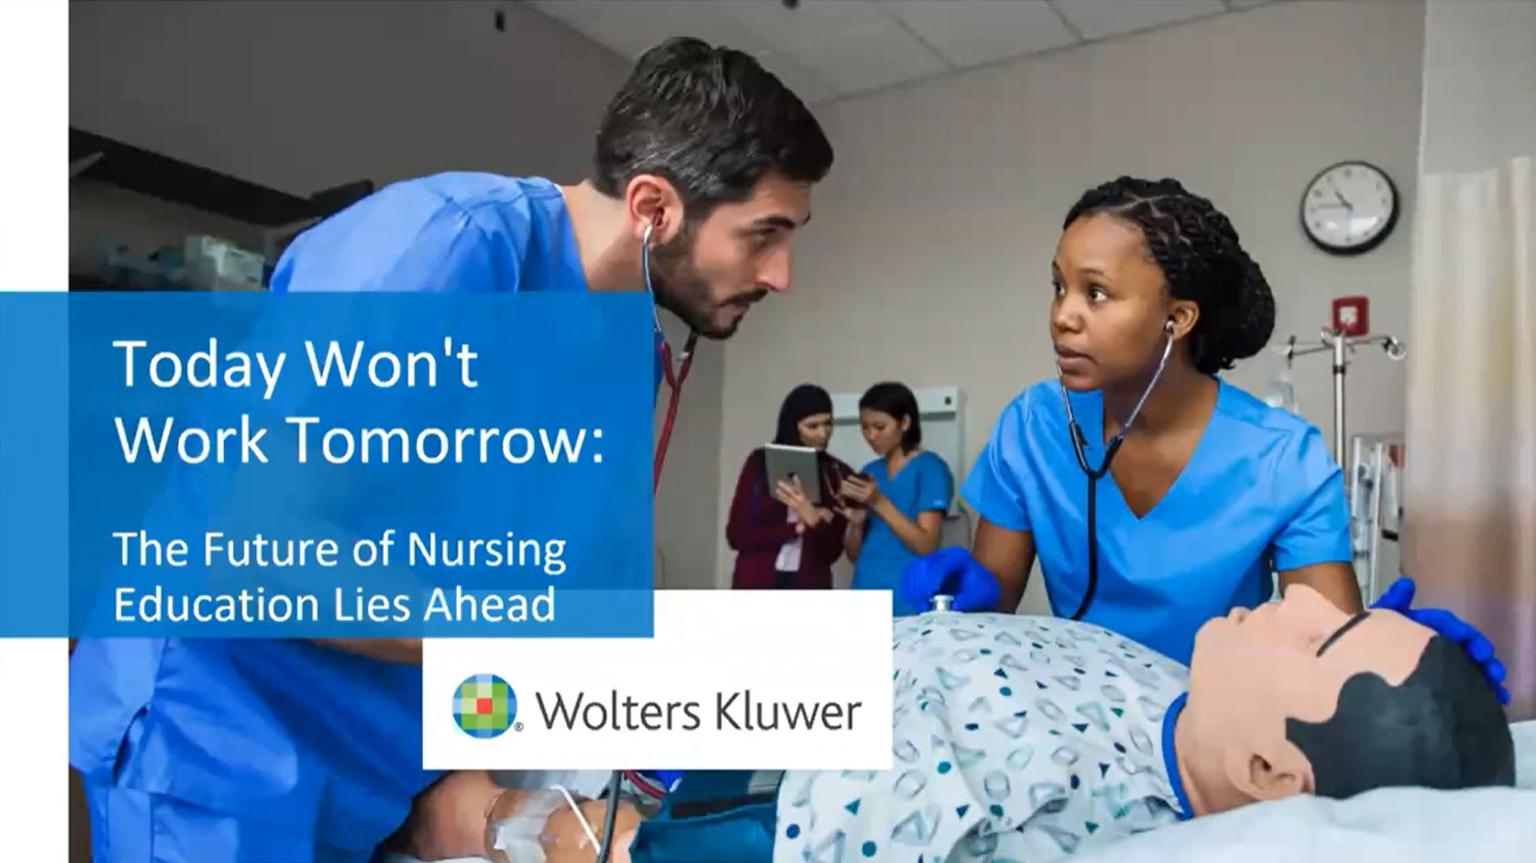 Screenshot of Today won't work tomorrow: The future of nursing education lies ahead video